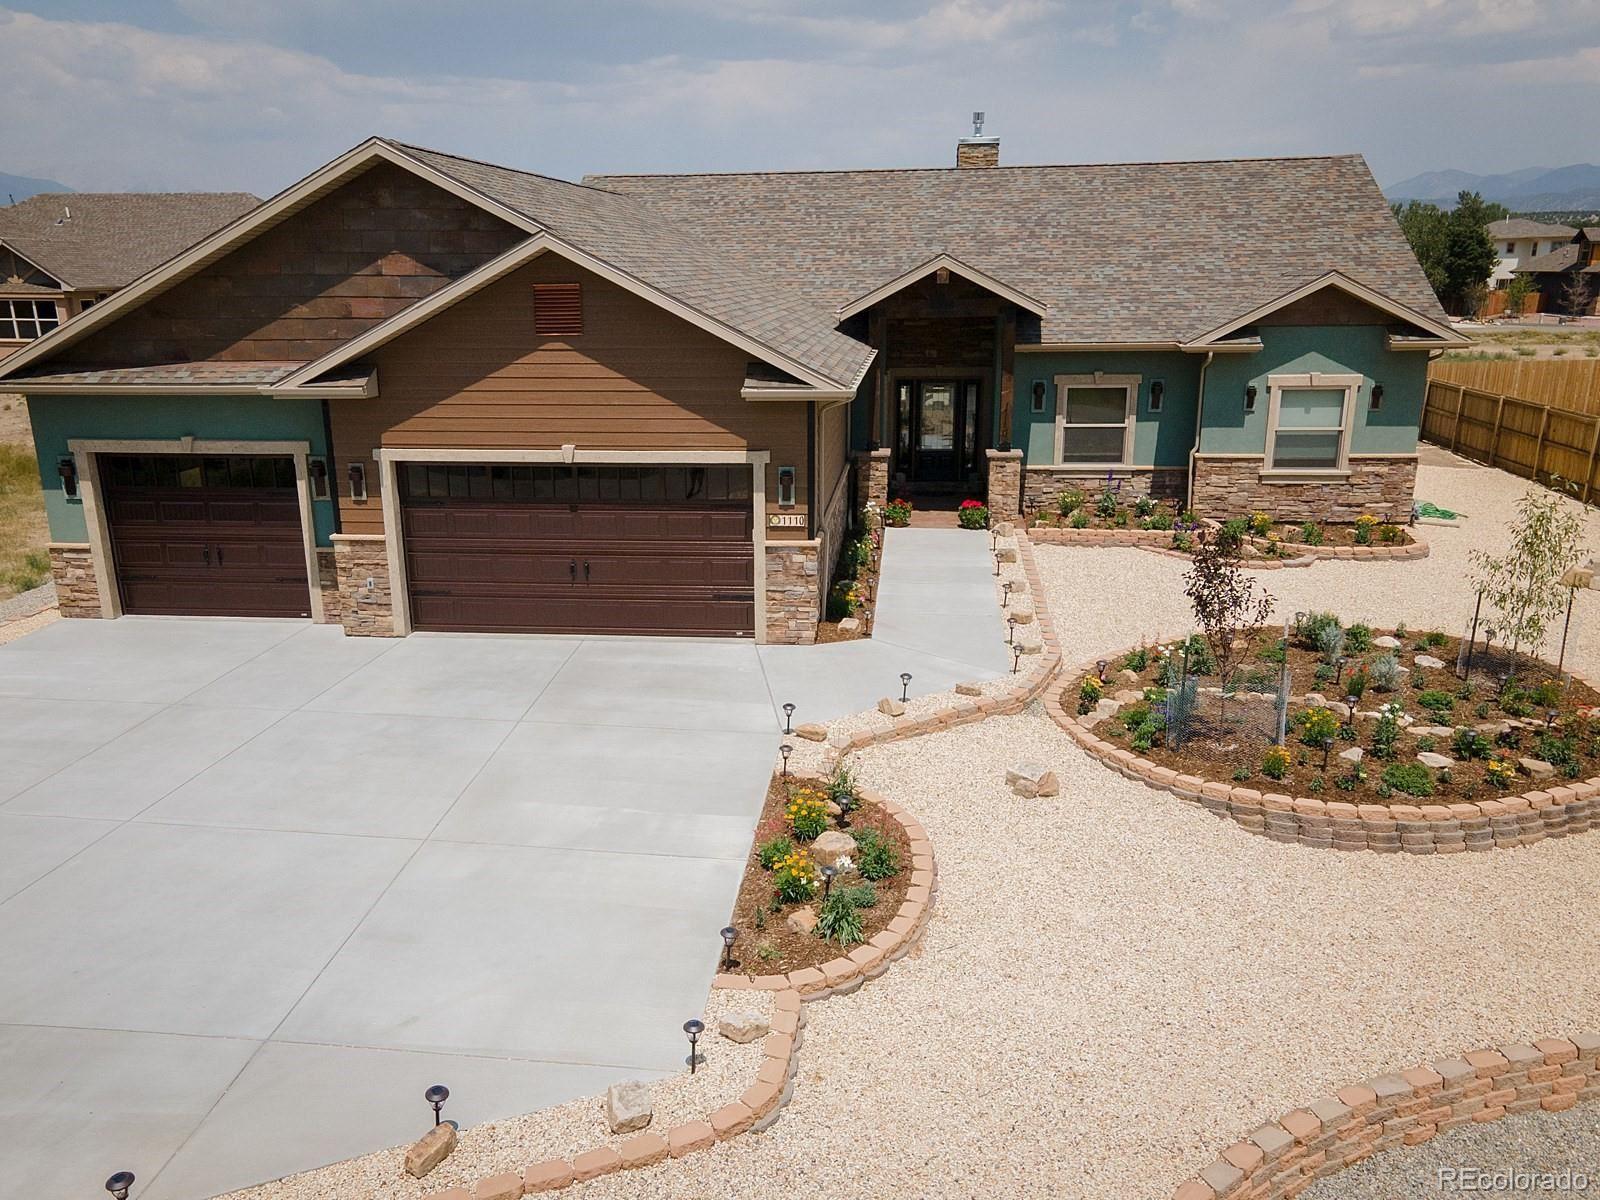 1110 E Ouray, Poncha Springs, CO 81242 - MLS#: 2938119